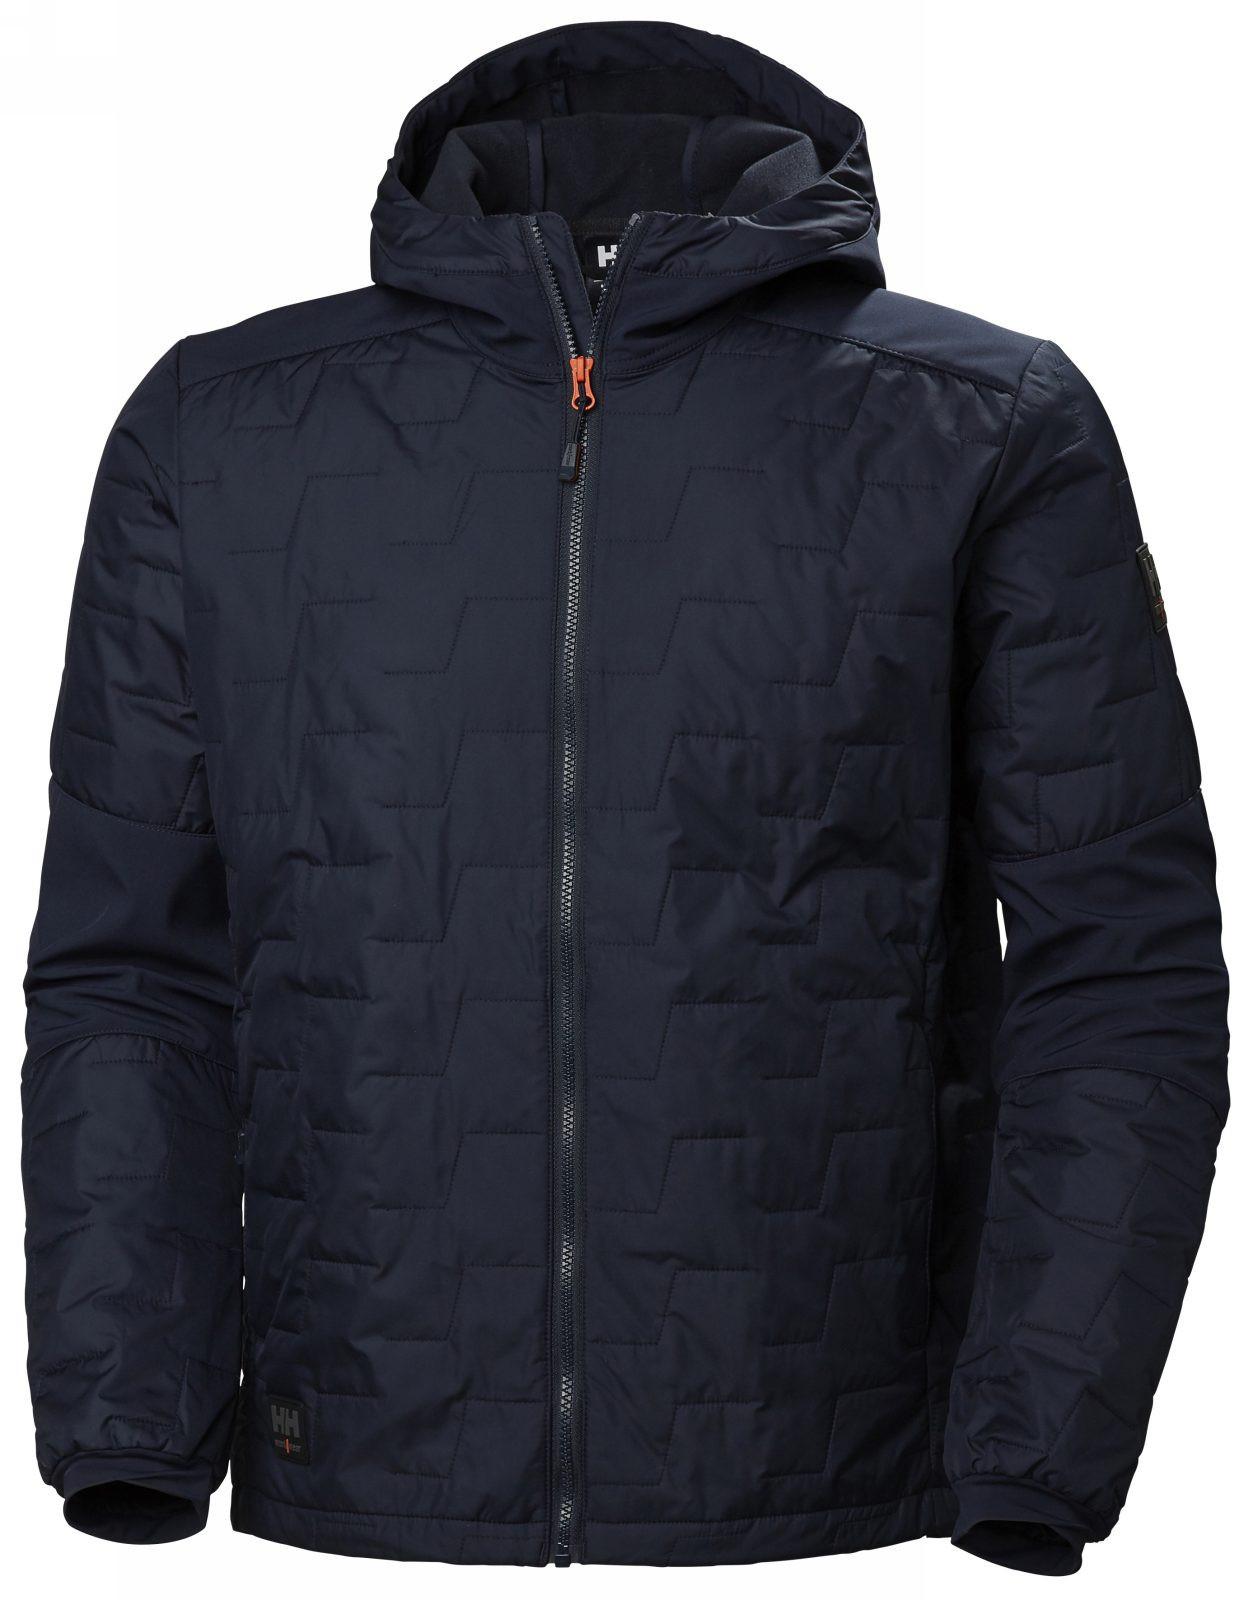 Куртка Helly Hansen Kensington Hooded Lifaloft Jacket - 73230 (Navy)